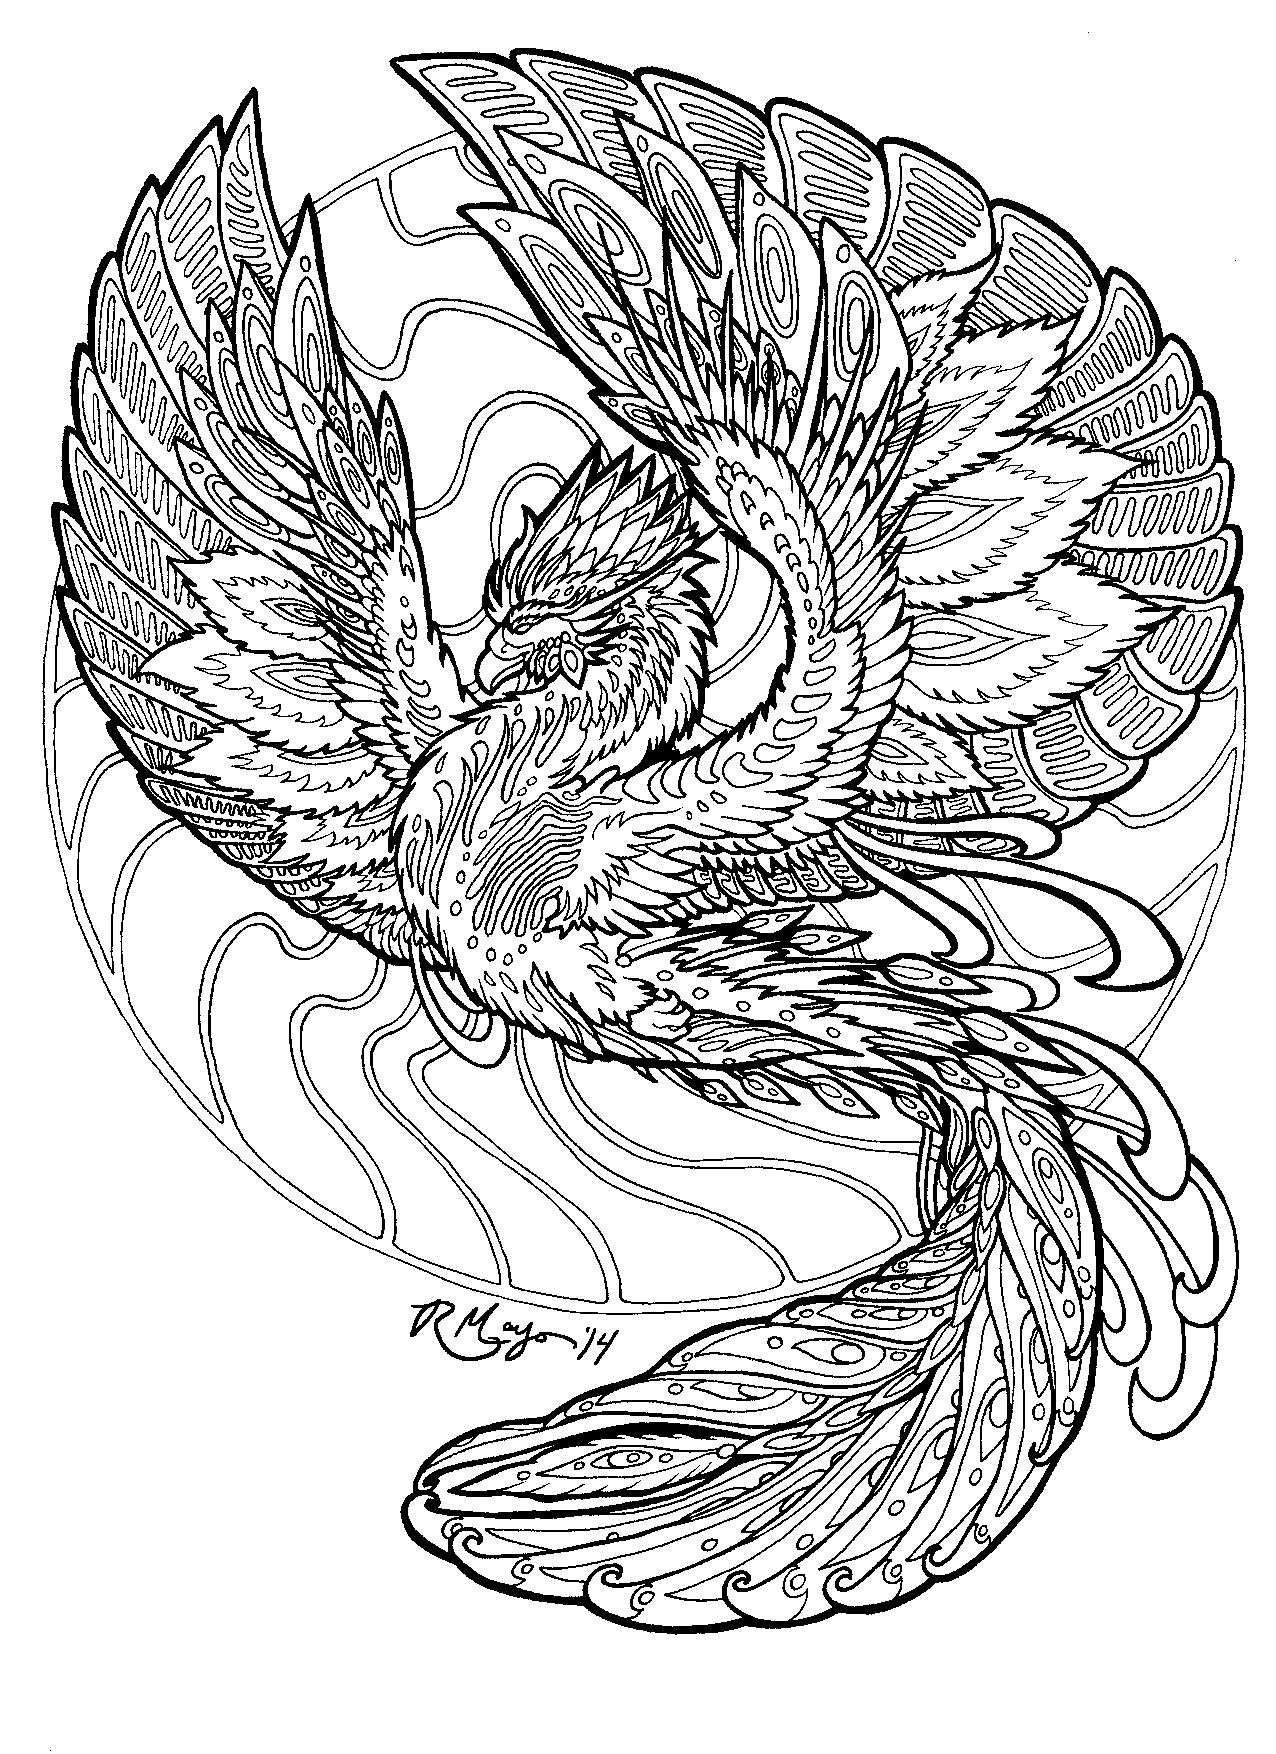 distant star 02 lineartrachaelm5 on deviantart